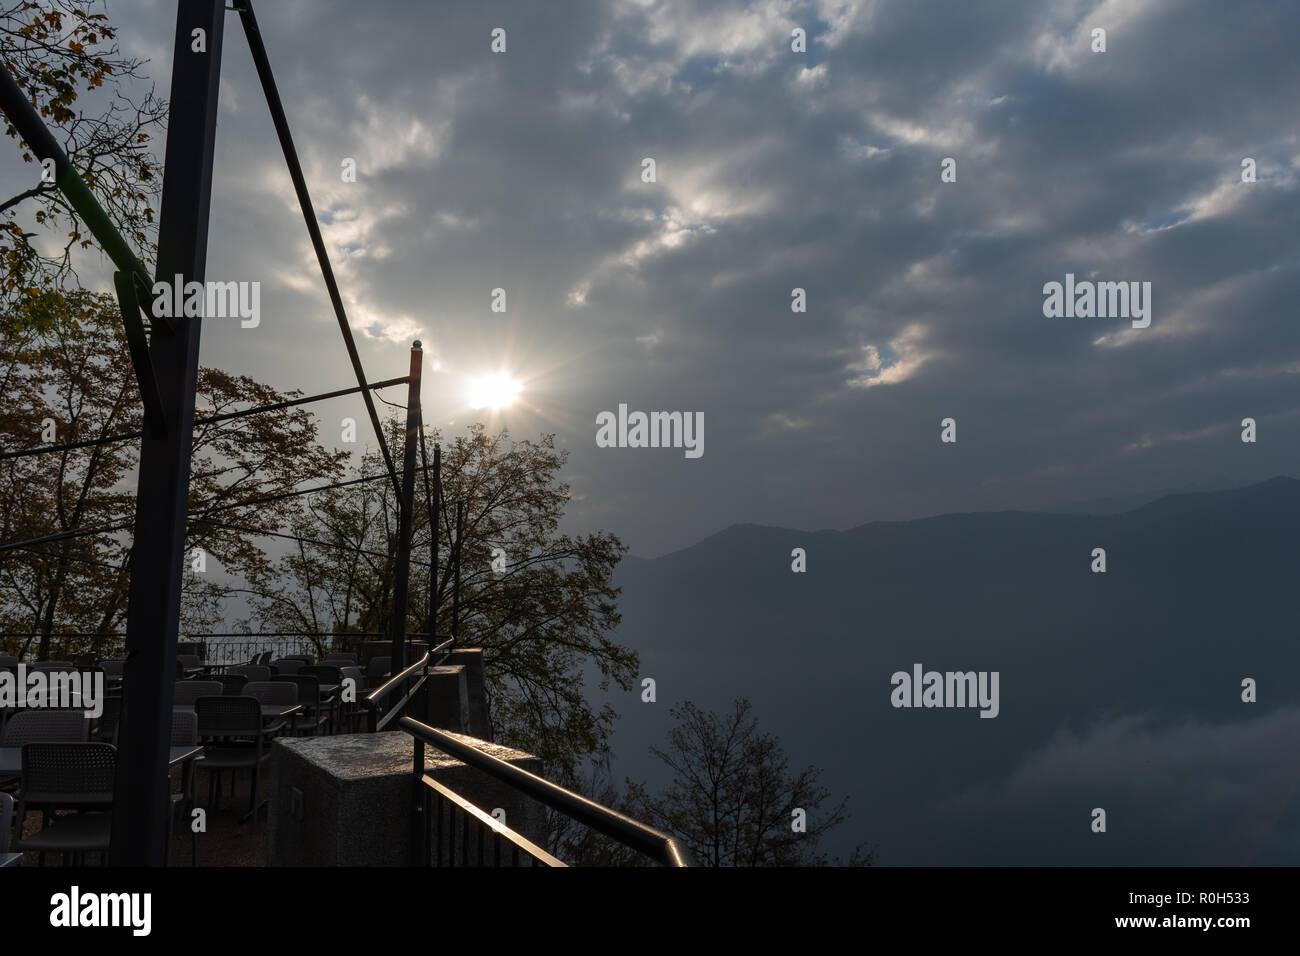 Views on parks and autumn villages - Blick auf Parks und Herbstdörfer - Viste su parchi e villaggi autunnali - Stock Image